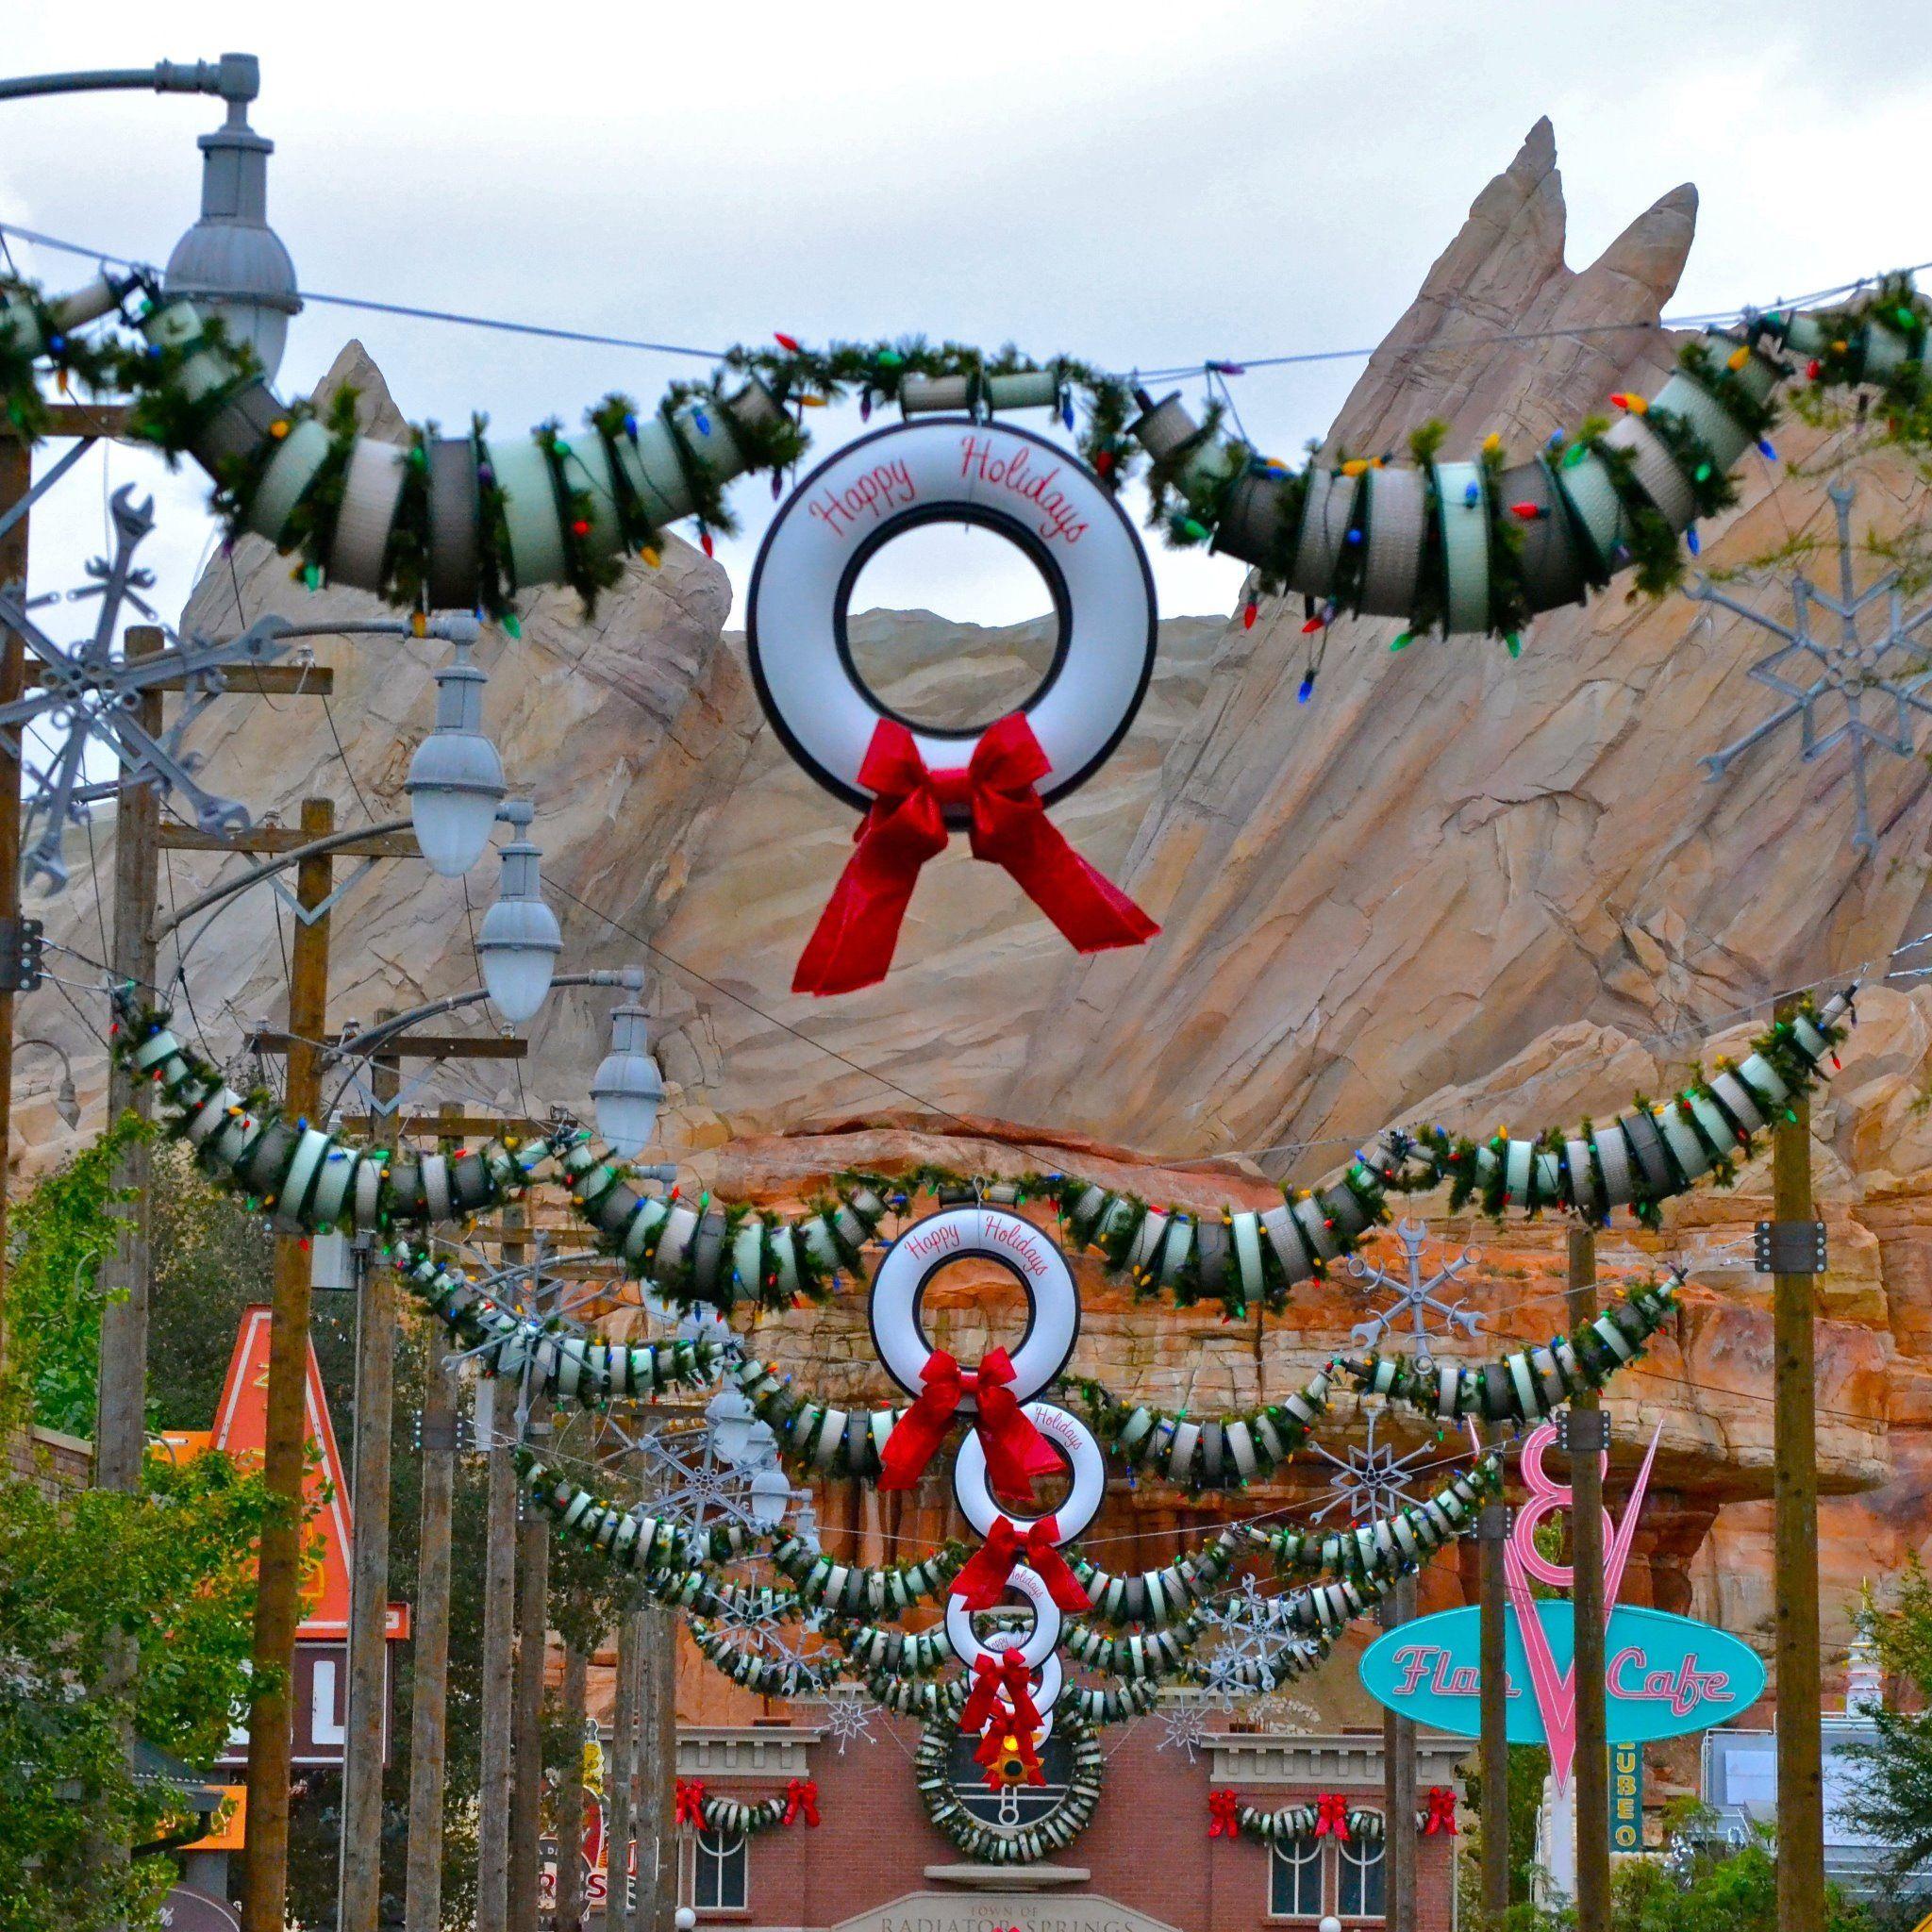 Carsland Disney California Adventure